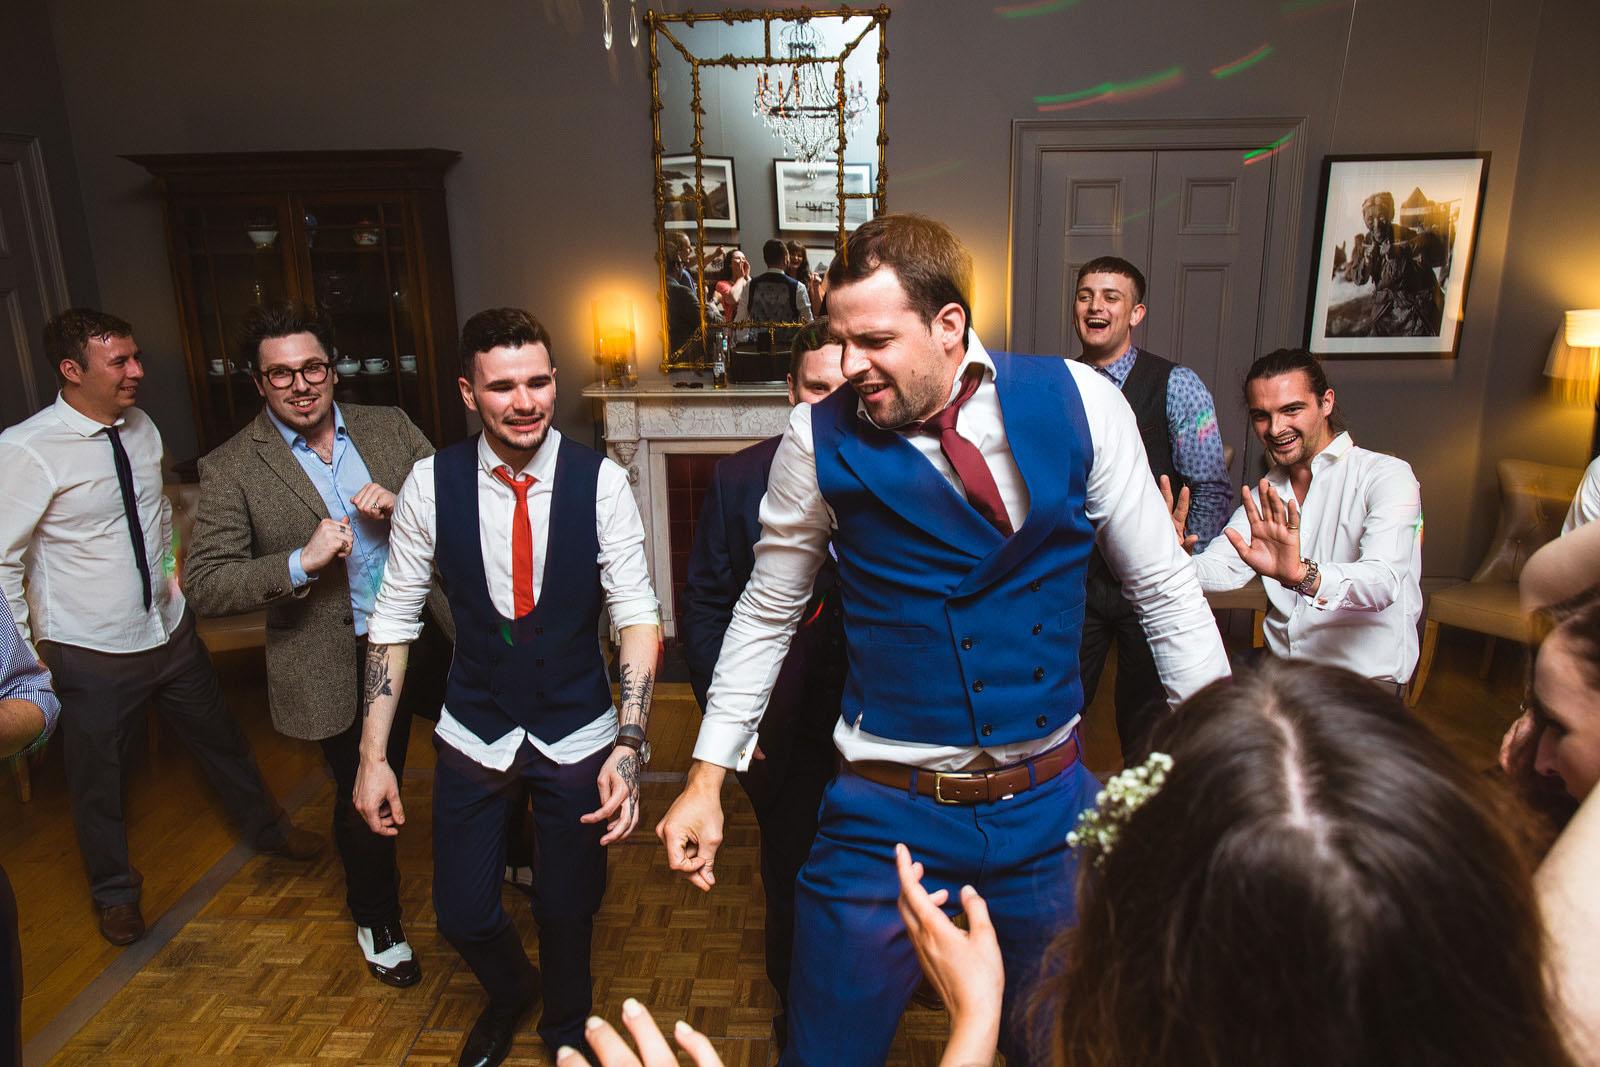 grays court wedding